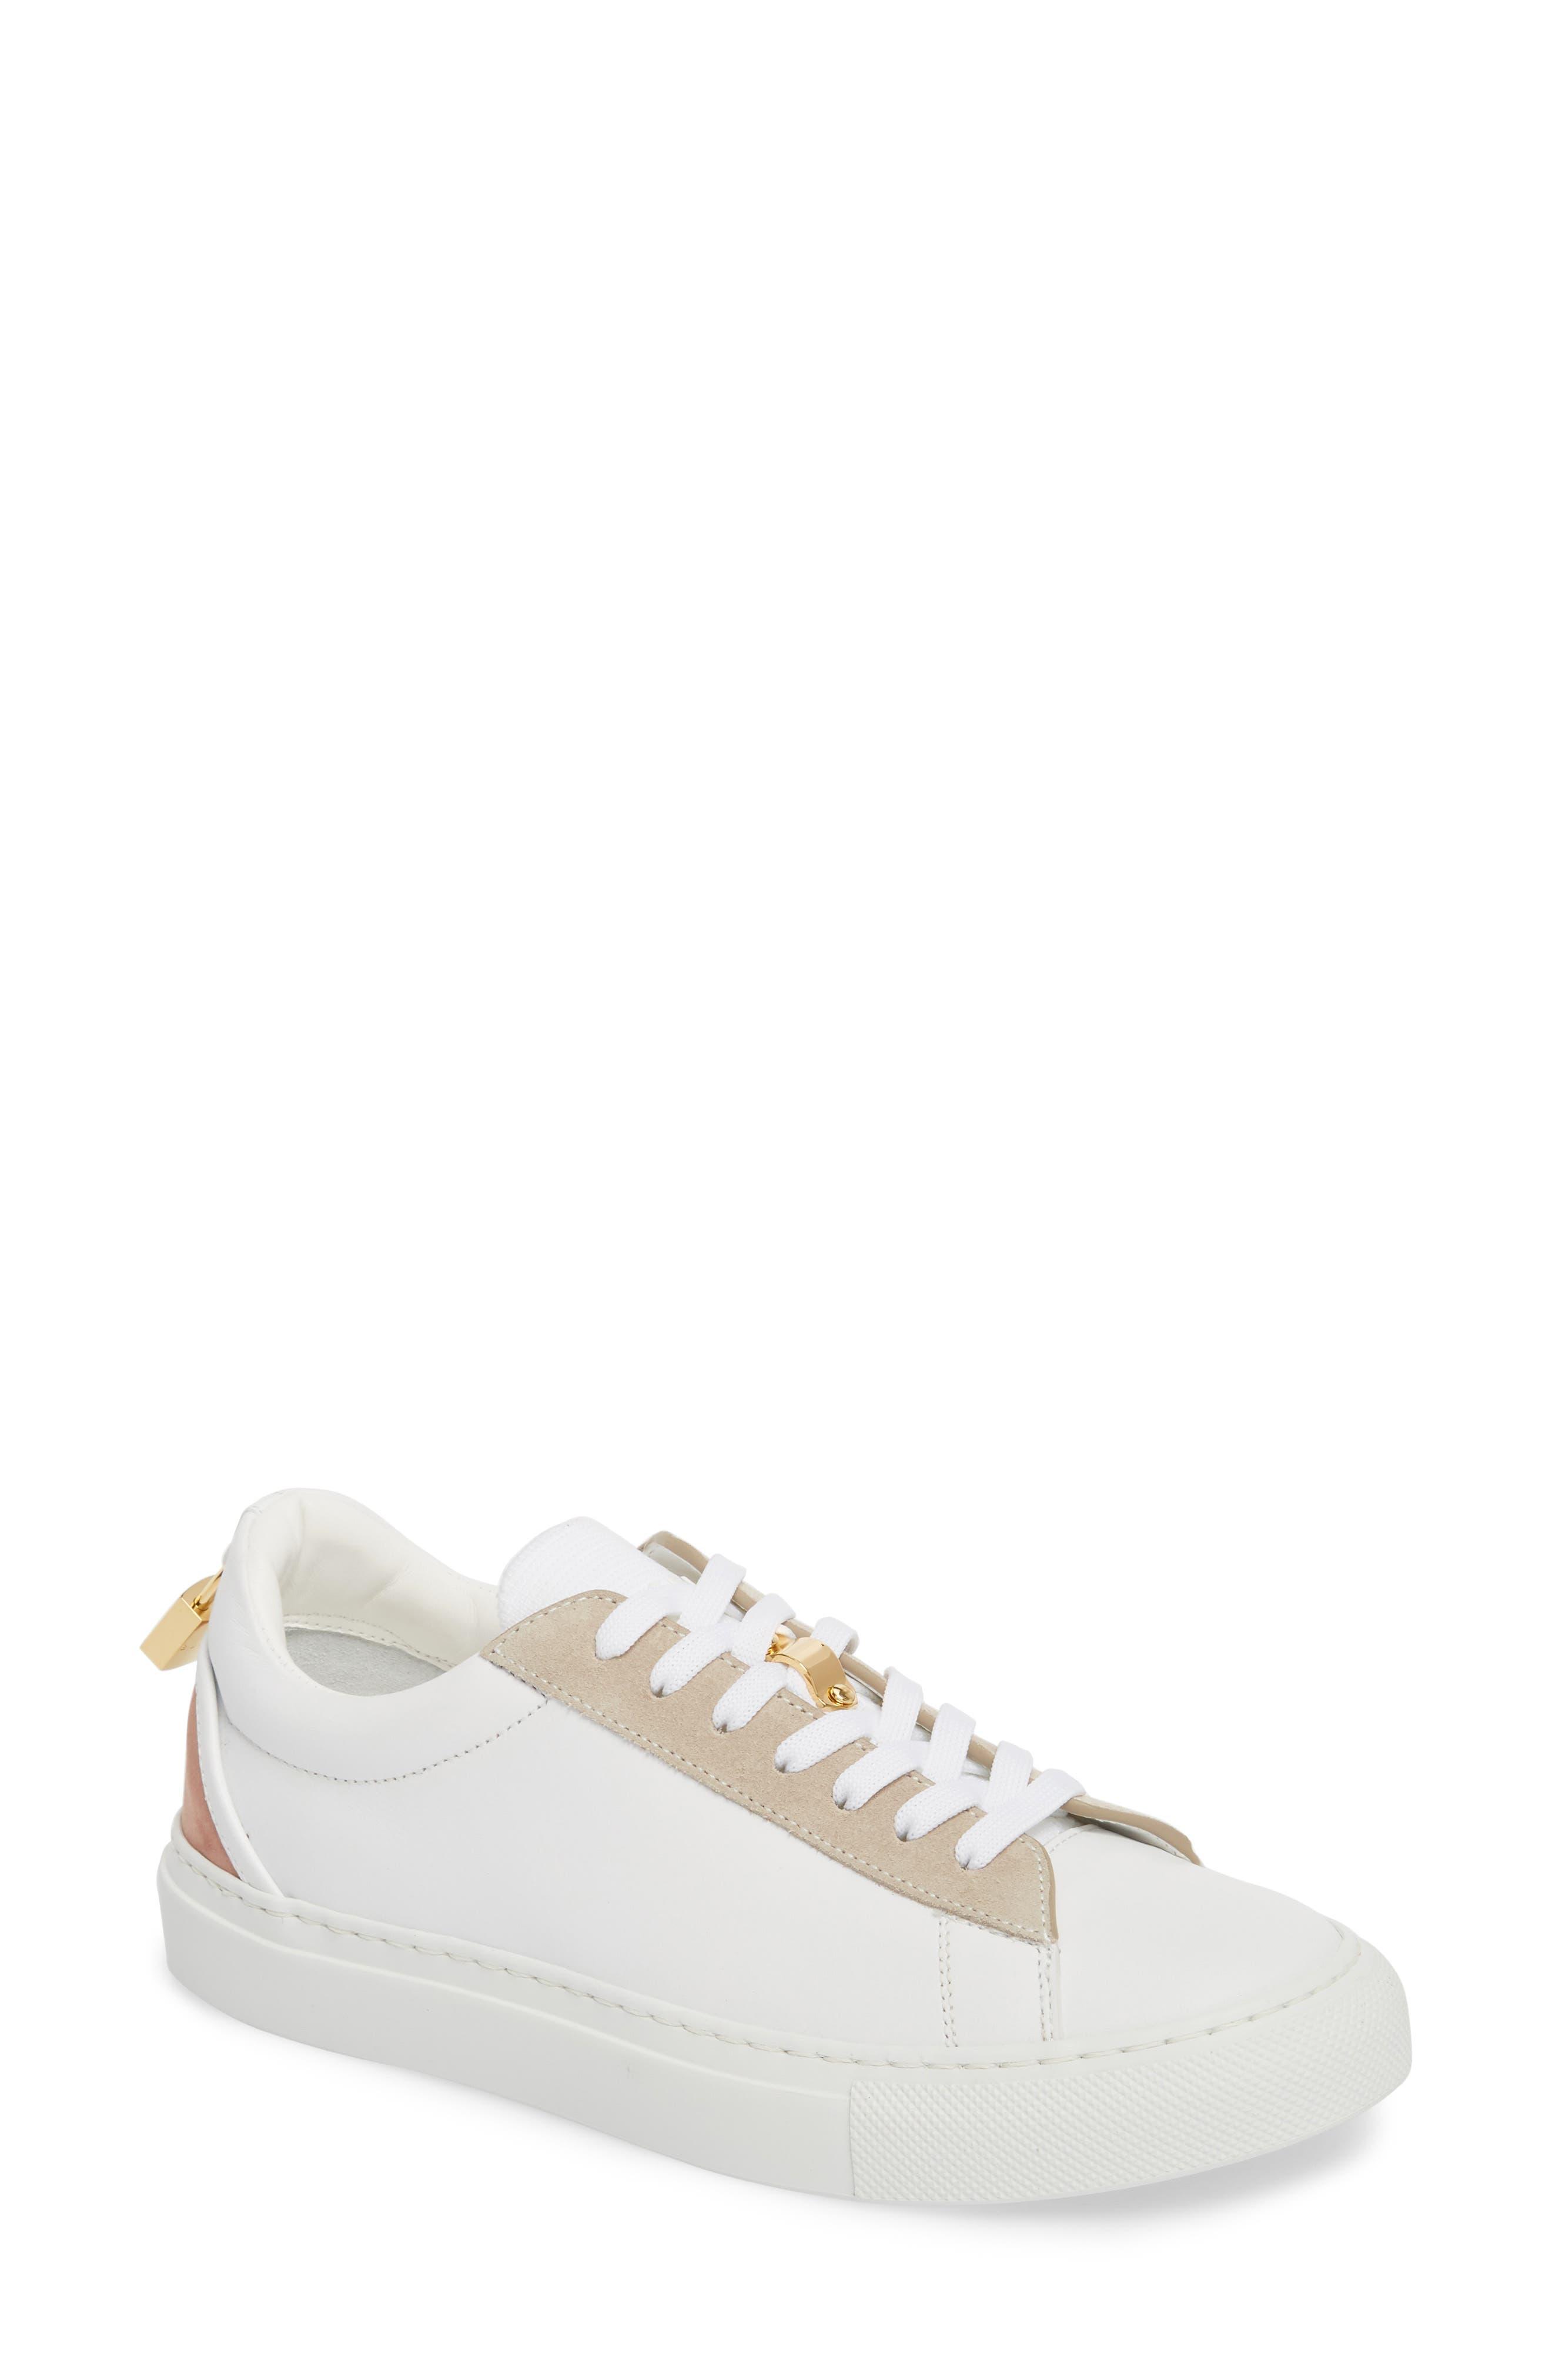 Tennis Lock Sneaker,                             Main thumbnail 1, color,                             White/ Dusty Pink